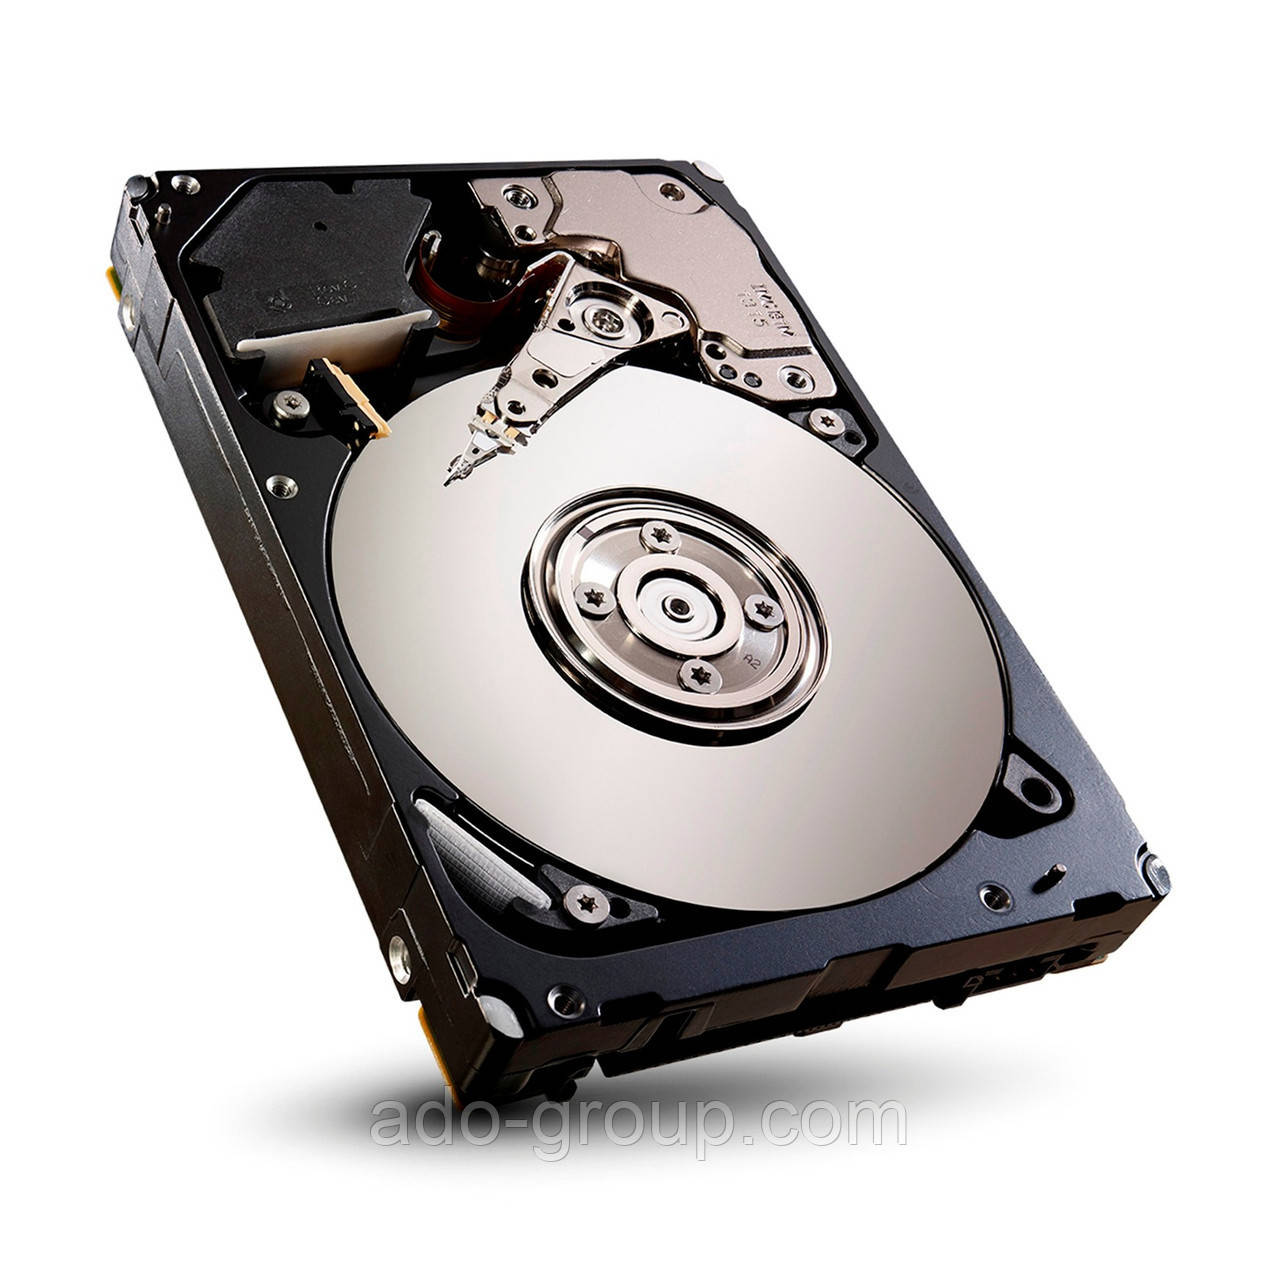 "H962F Жесткий диск Dell 250GB SATA 7.2K  3.5"" +"